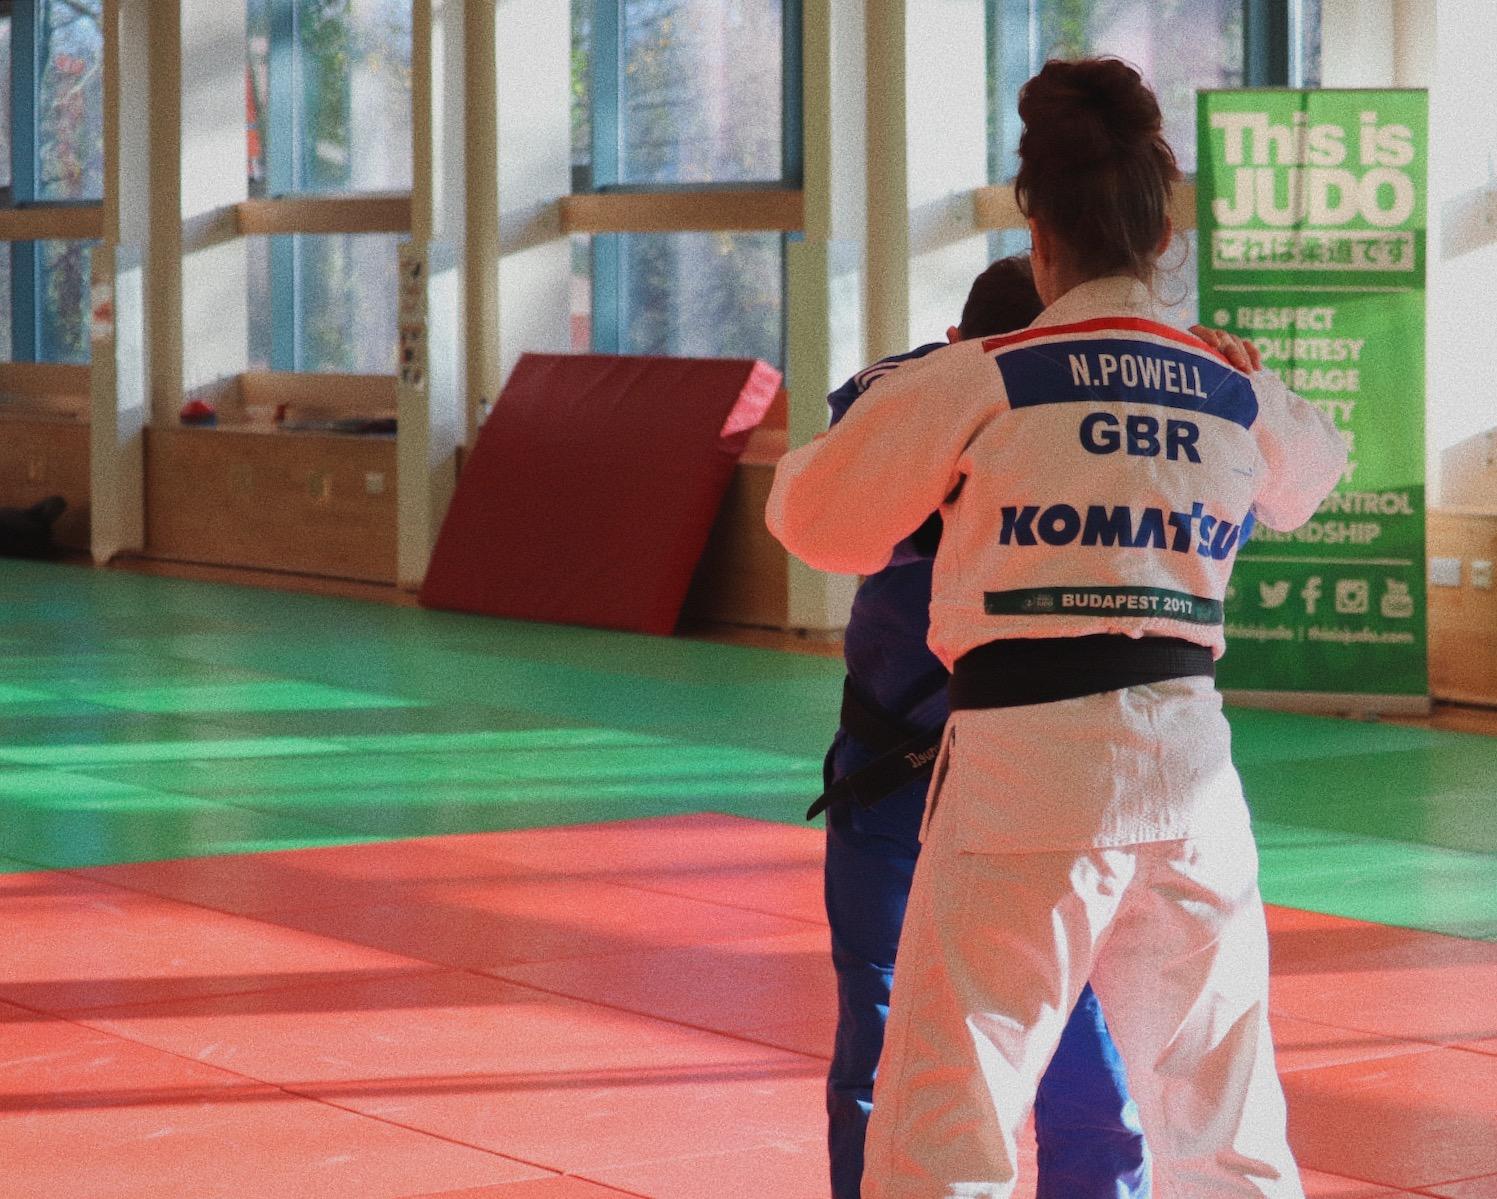 Natalie-powell-womens-sport-judo-SLOWE-7.JPG